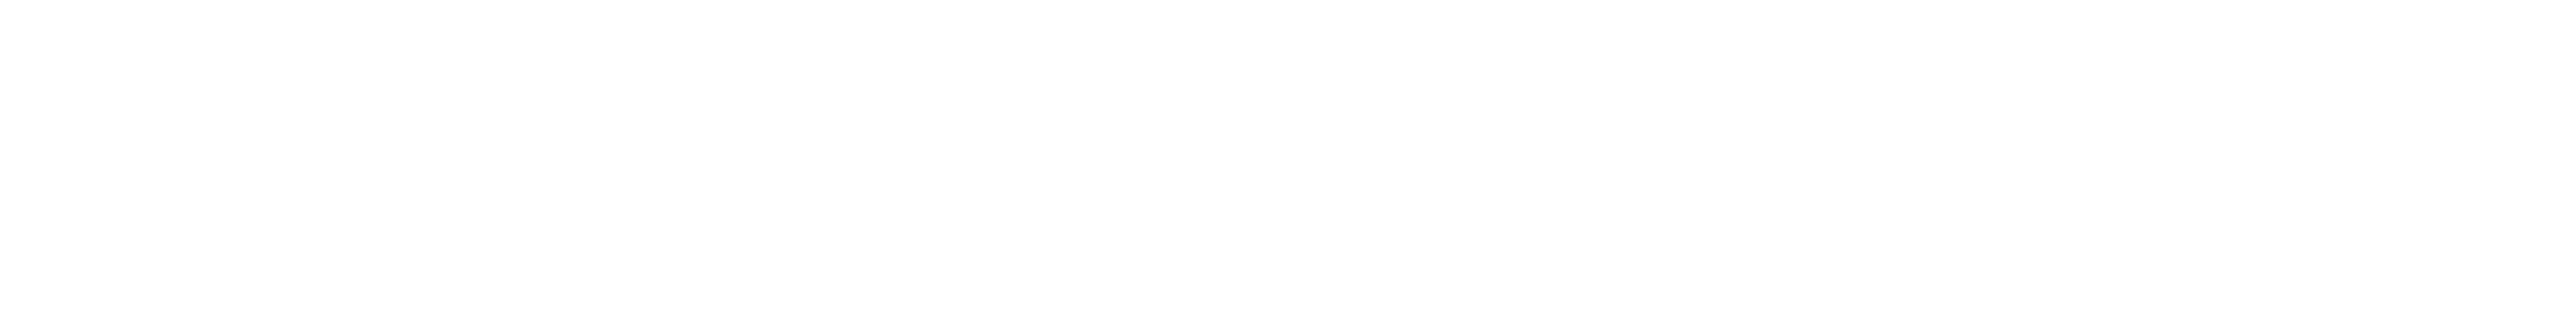 GGWPGEAR